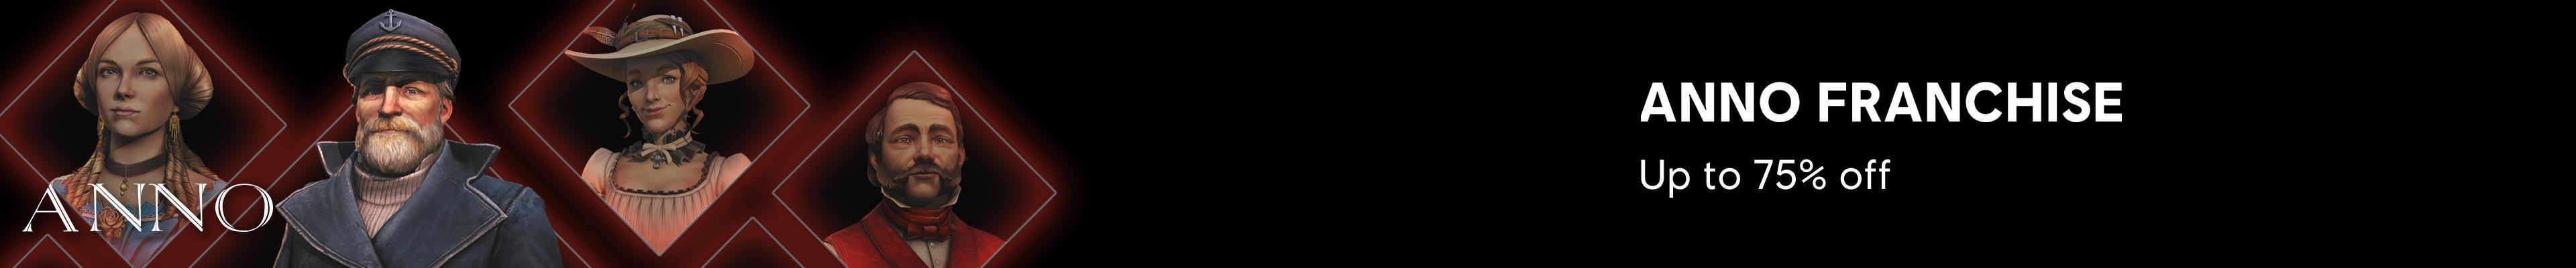 Anno Franchise - Black Friday Category banner